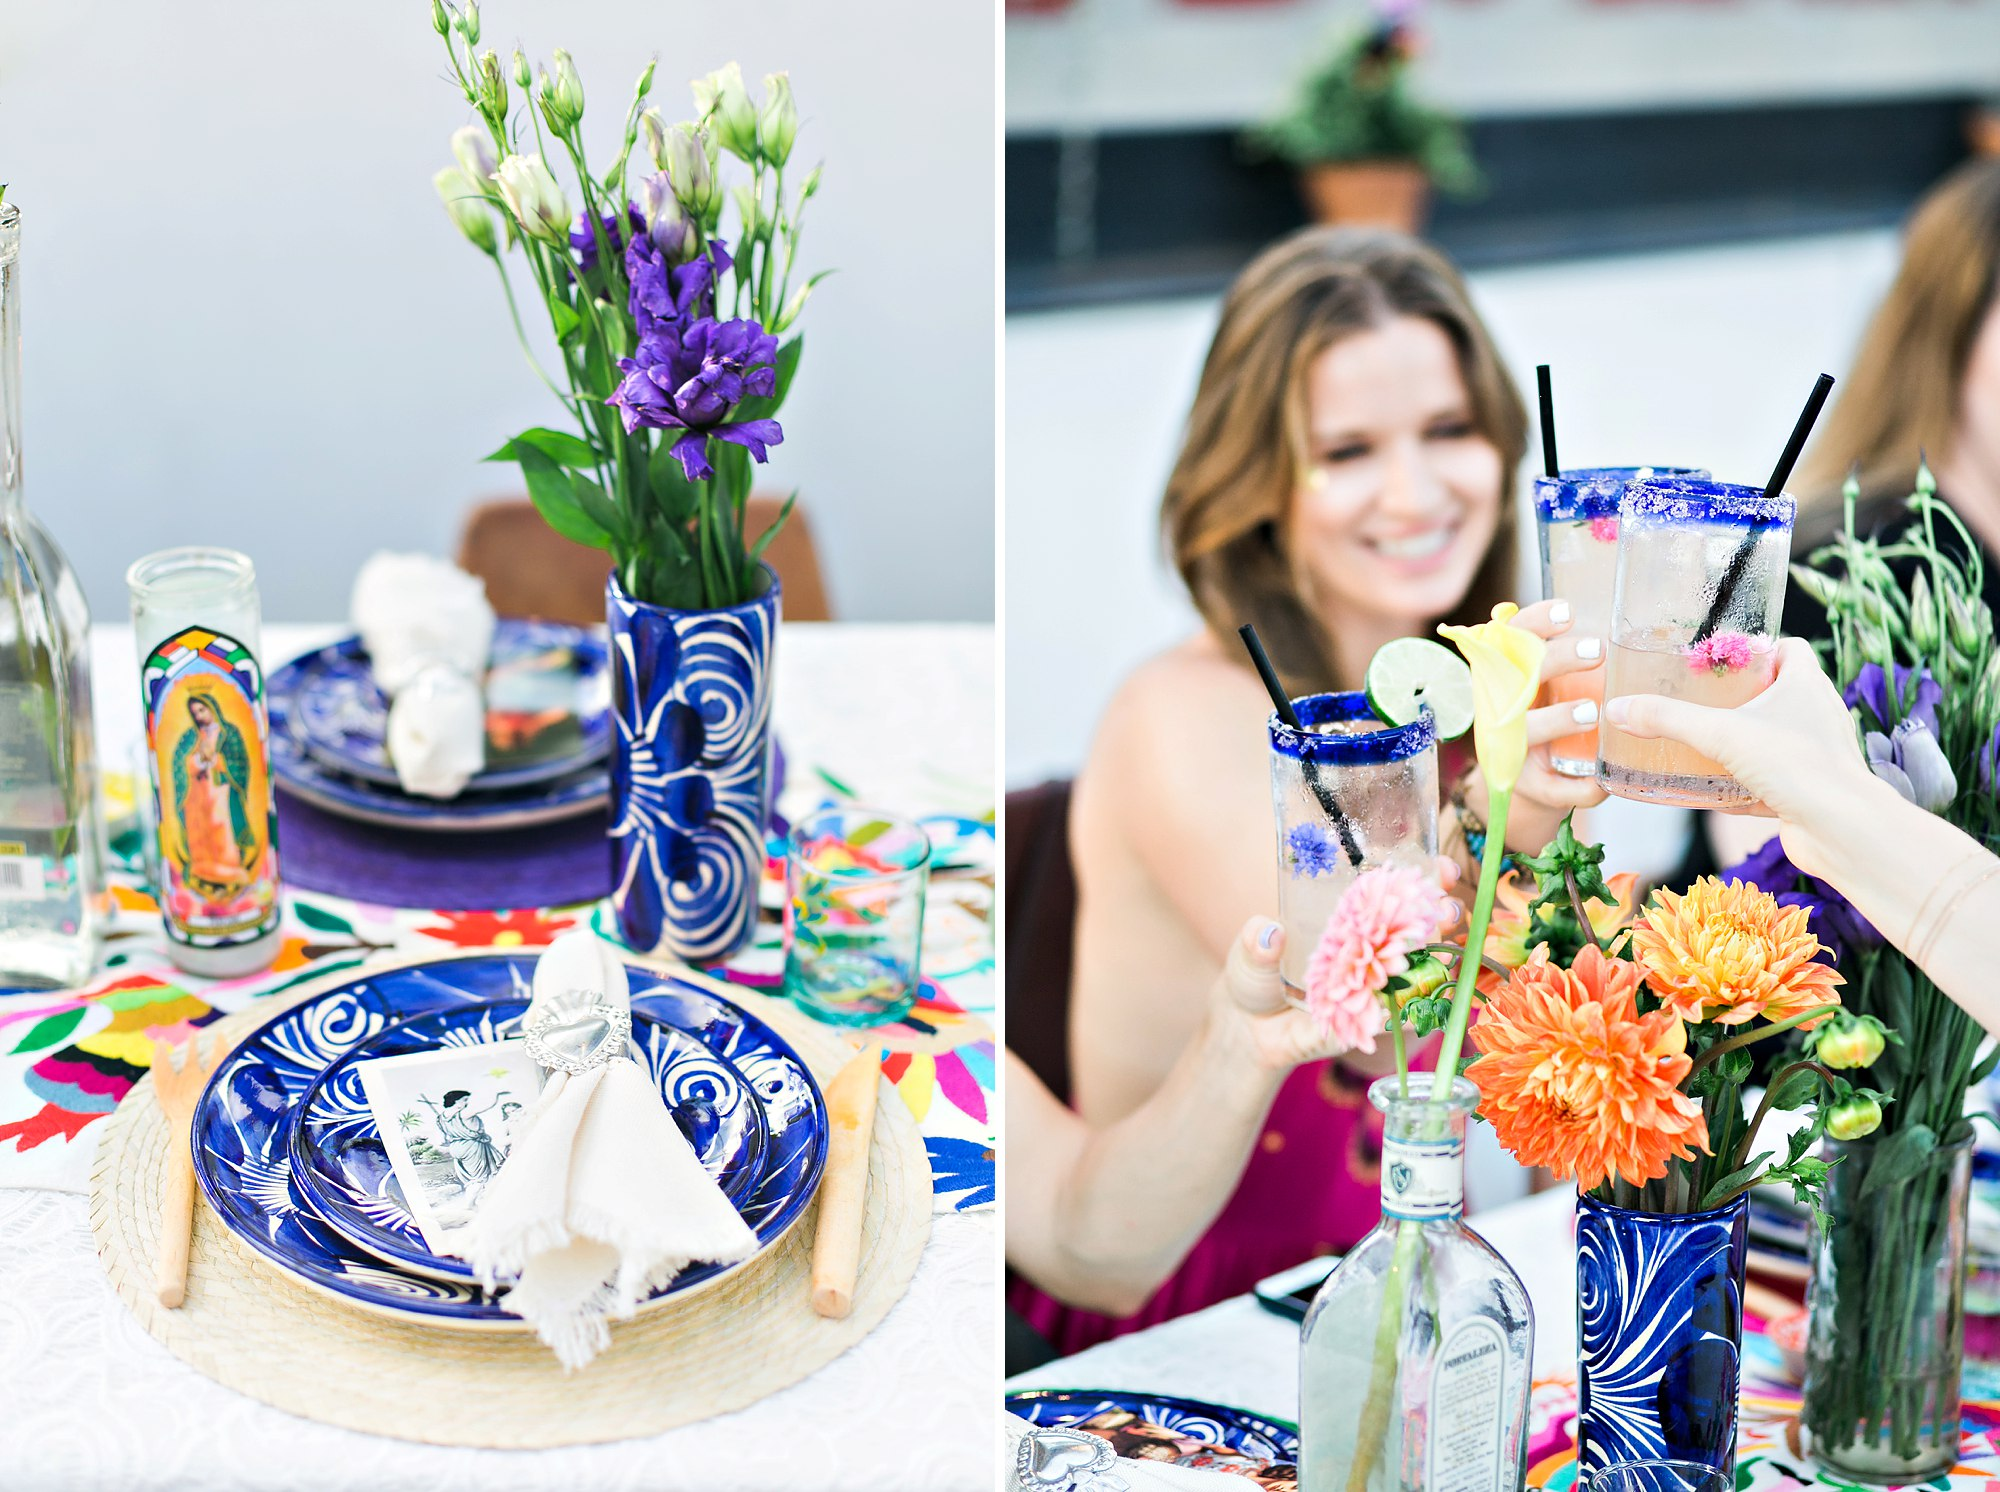 Kettner Exchange and Artelexia Dinner_0003.jpg